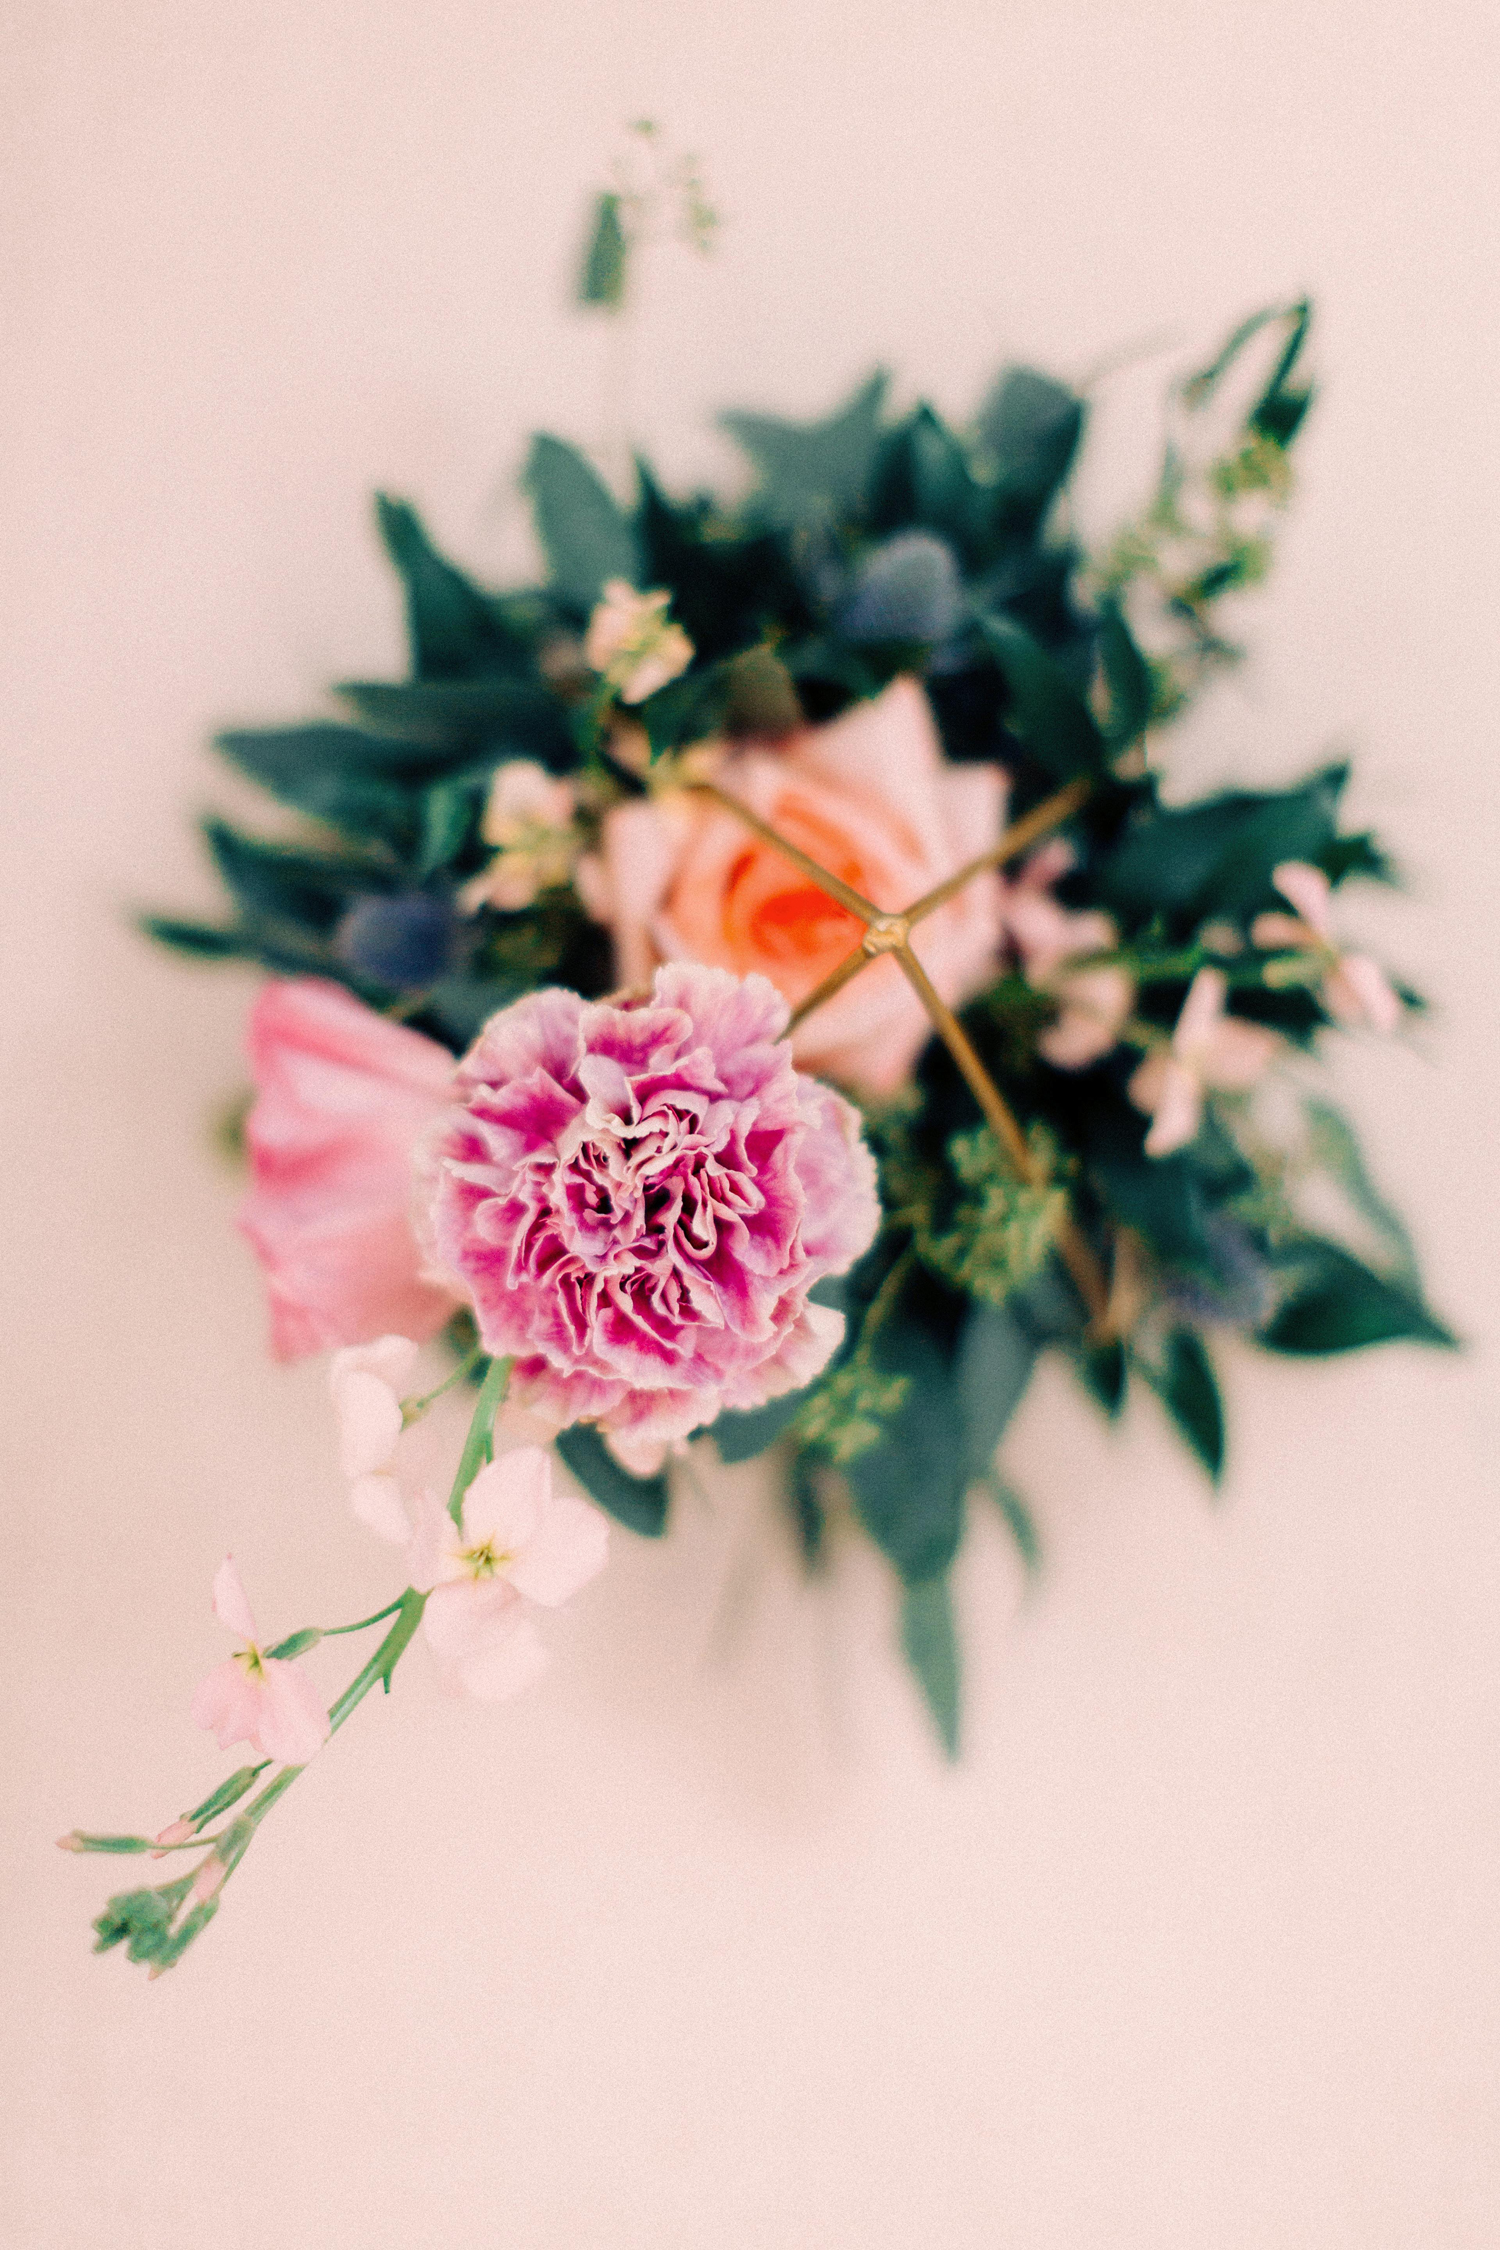 009-alaamarzouk-alaamarzoukphotography-mcallenweddingphotographer-alaa-marzouk-mcallen-mission-wedding-texas-venue-photography-wedding-california-bride-bridal-engagement-austin-elopement.jpg